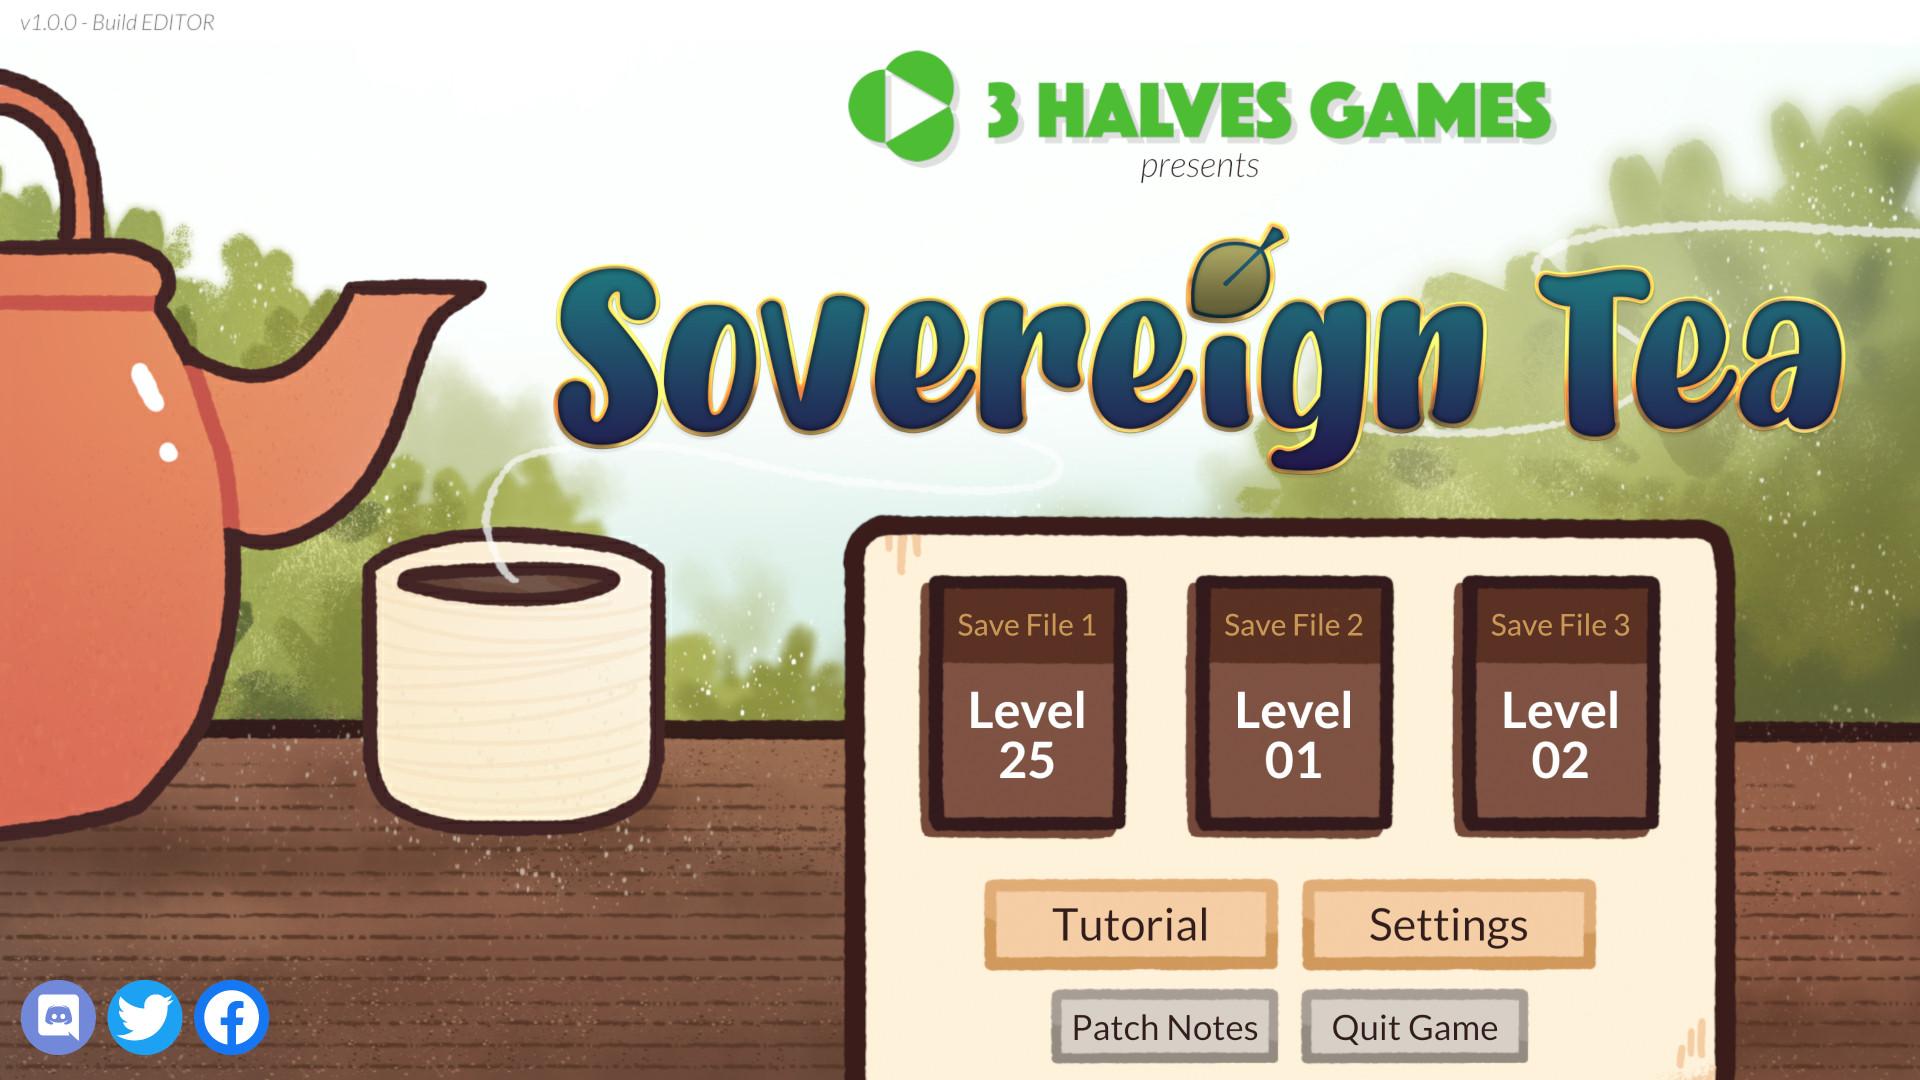 Sovereign Tea Free Download